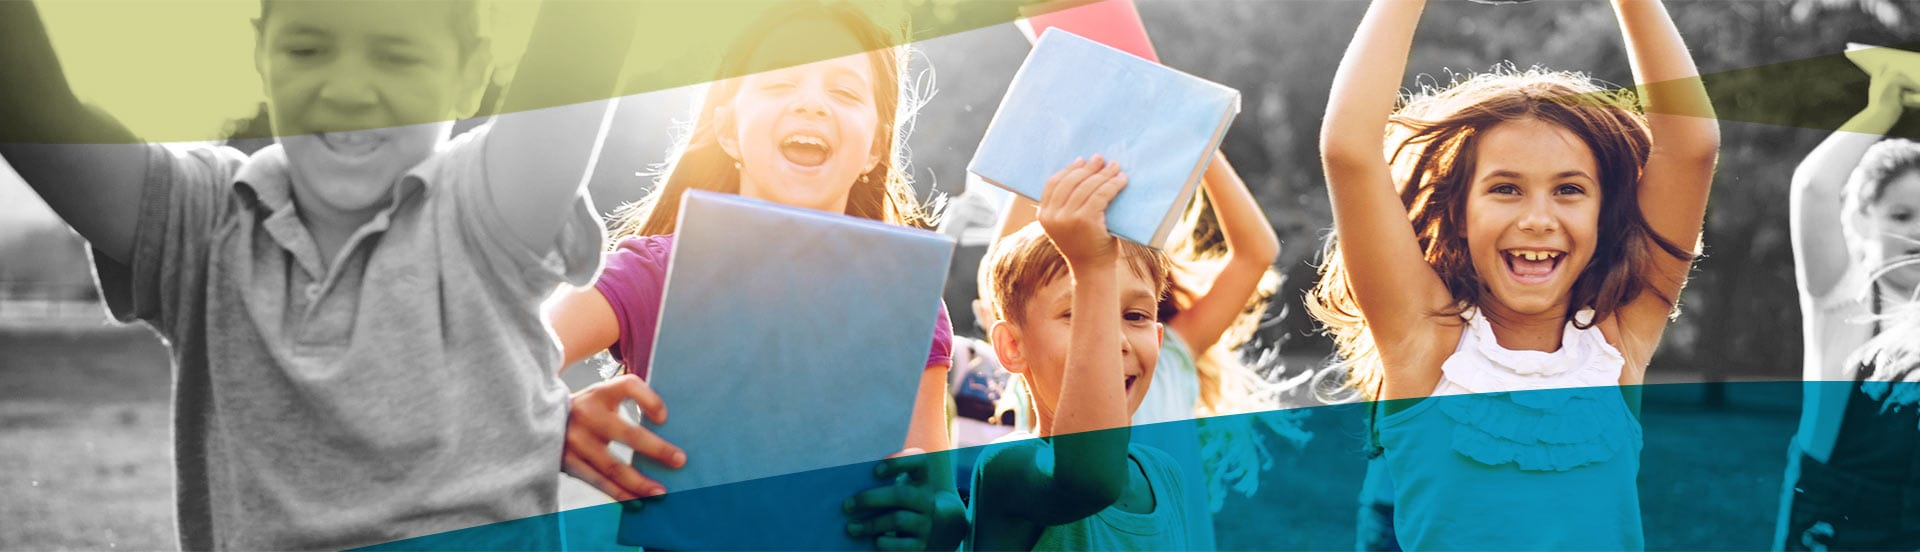 kids celebrating learning